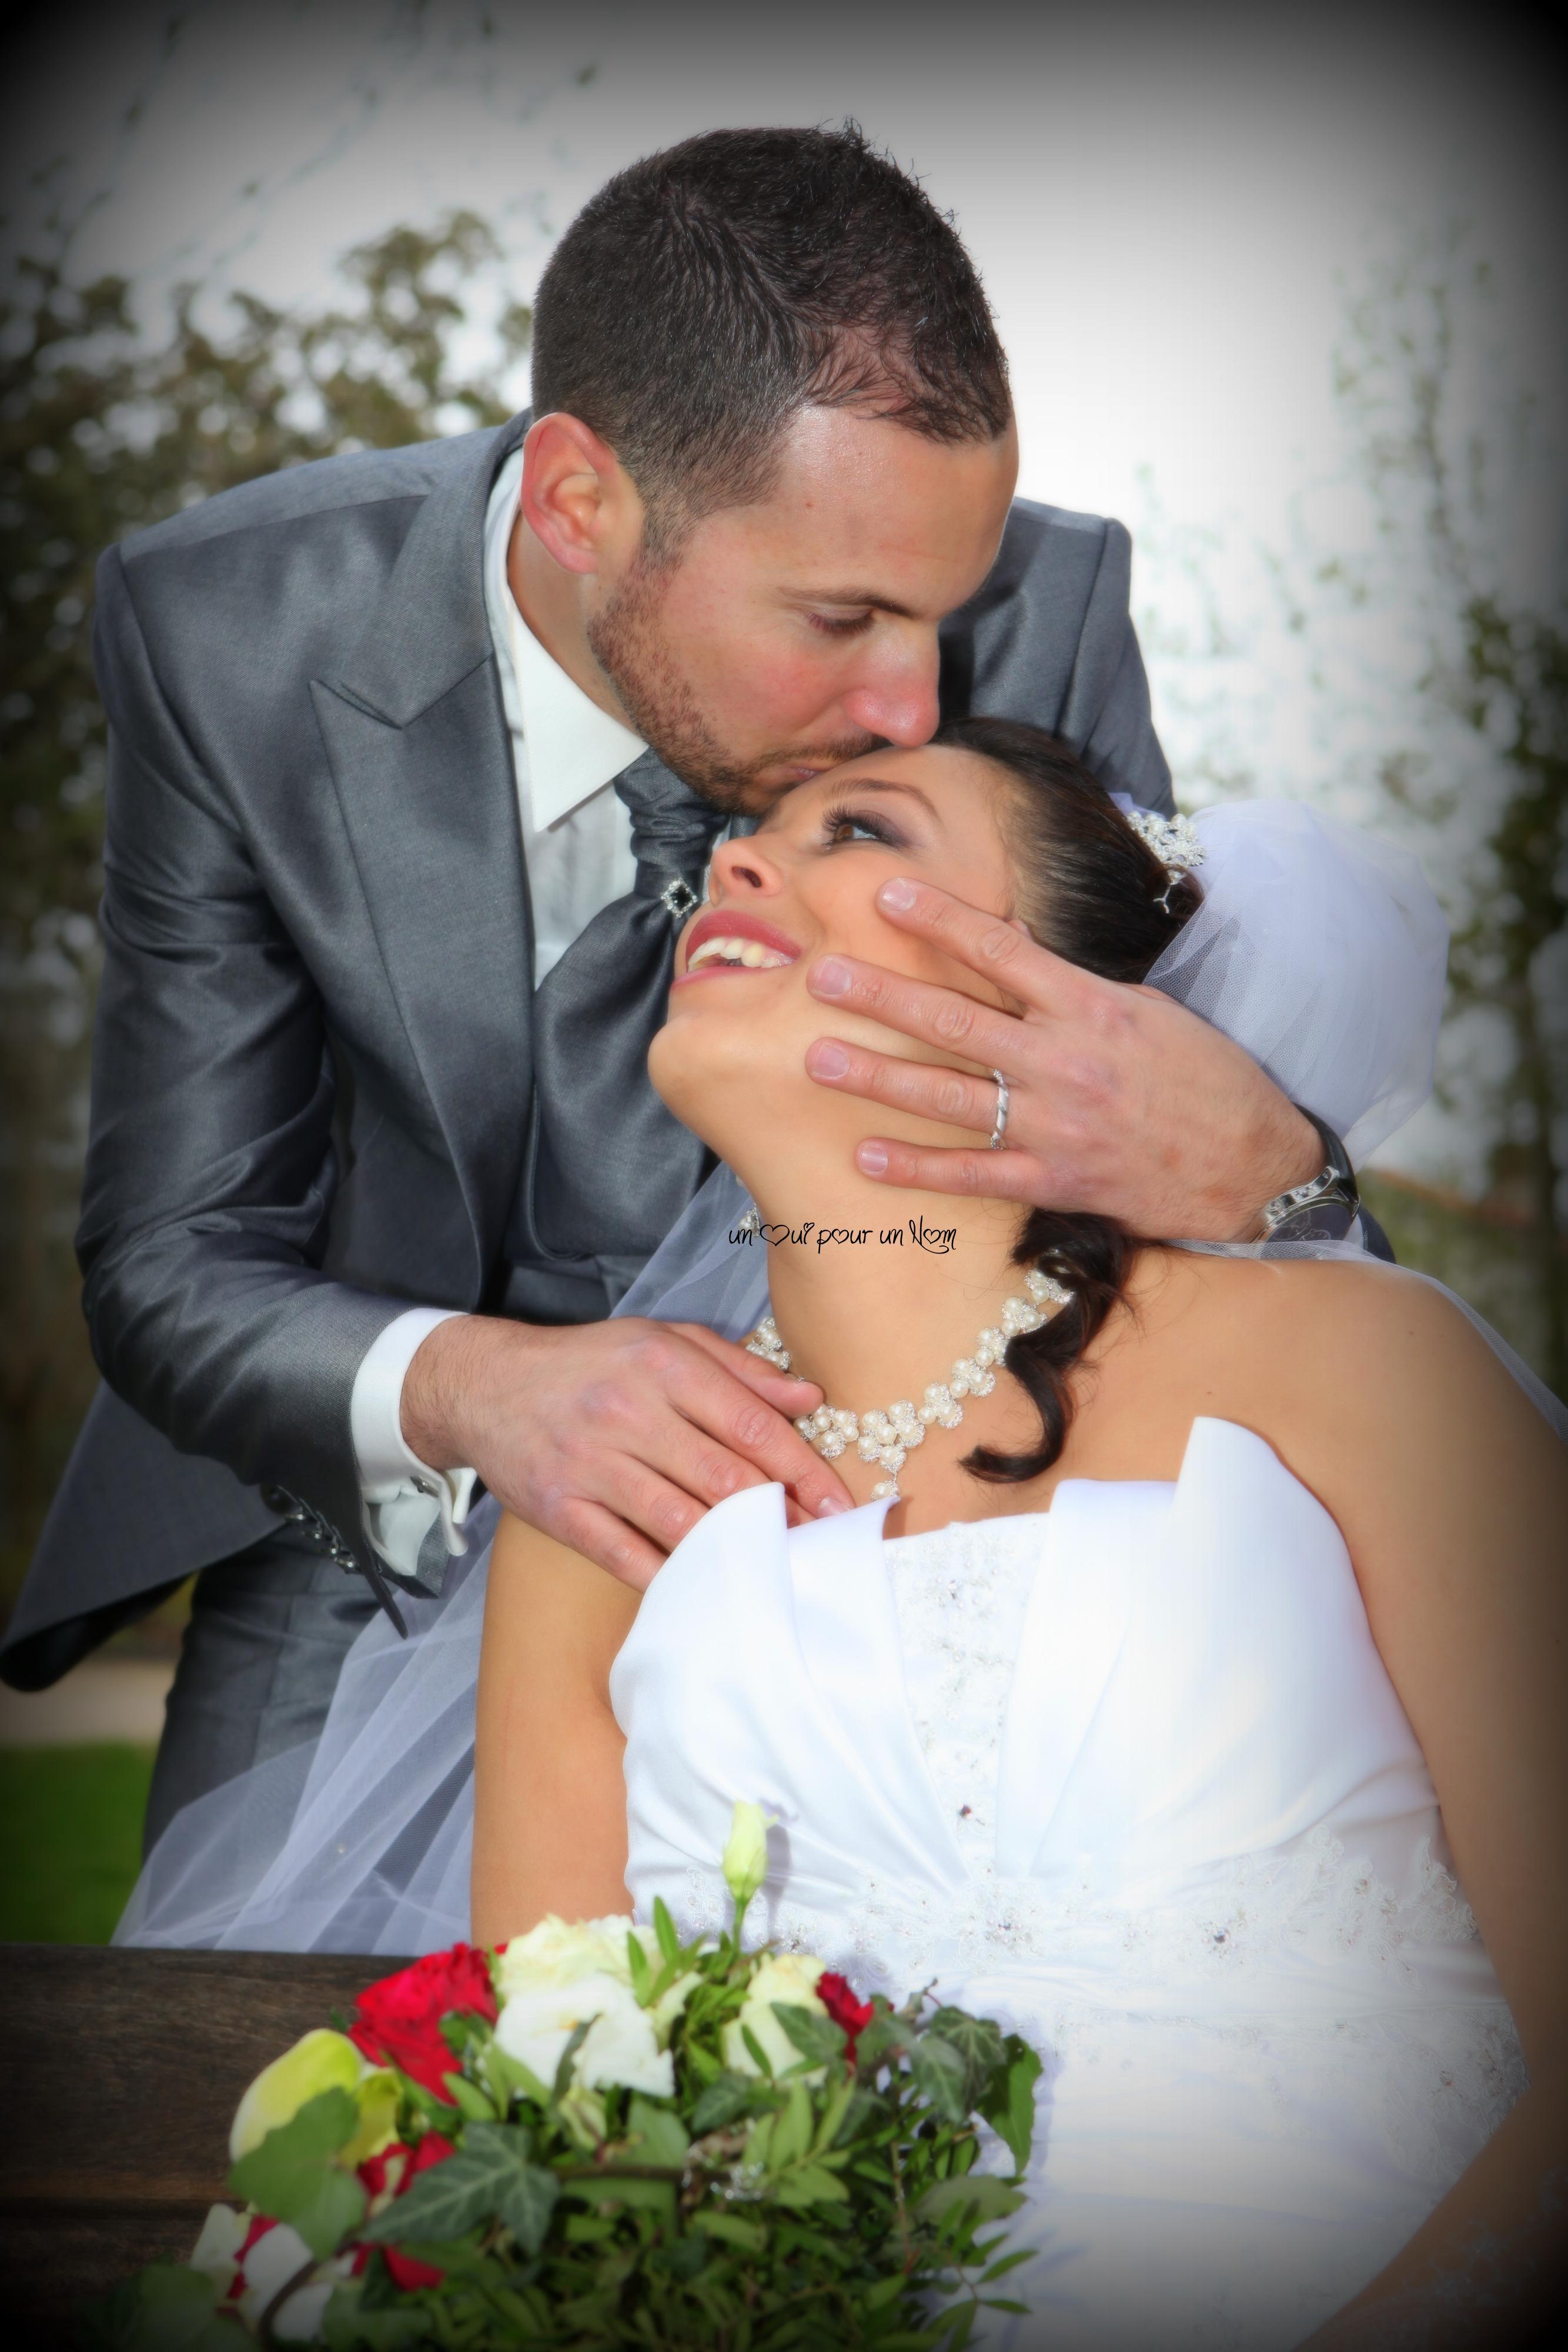 photographe cameraman mariage oriental nimes - Photographe Mariage Oriental